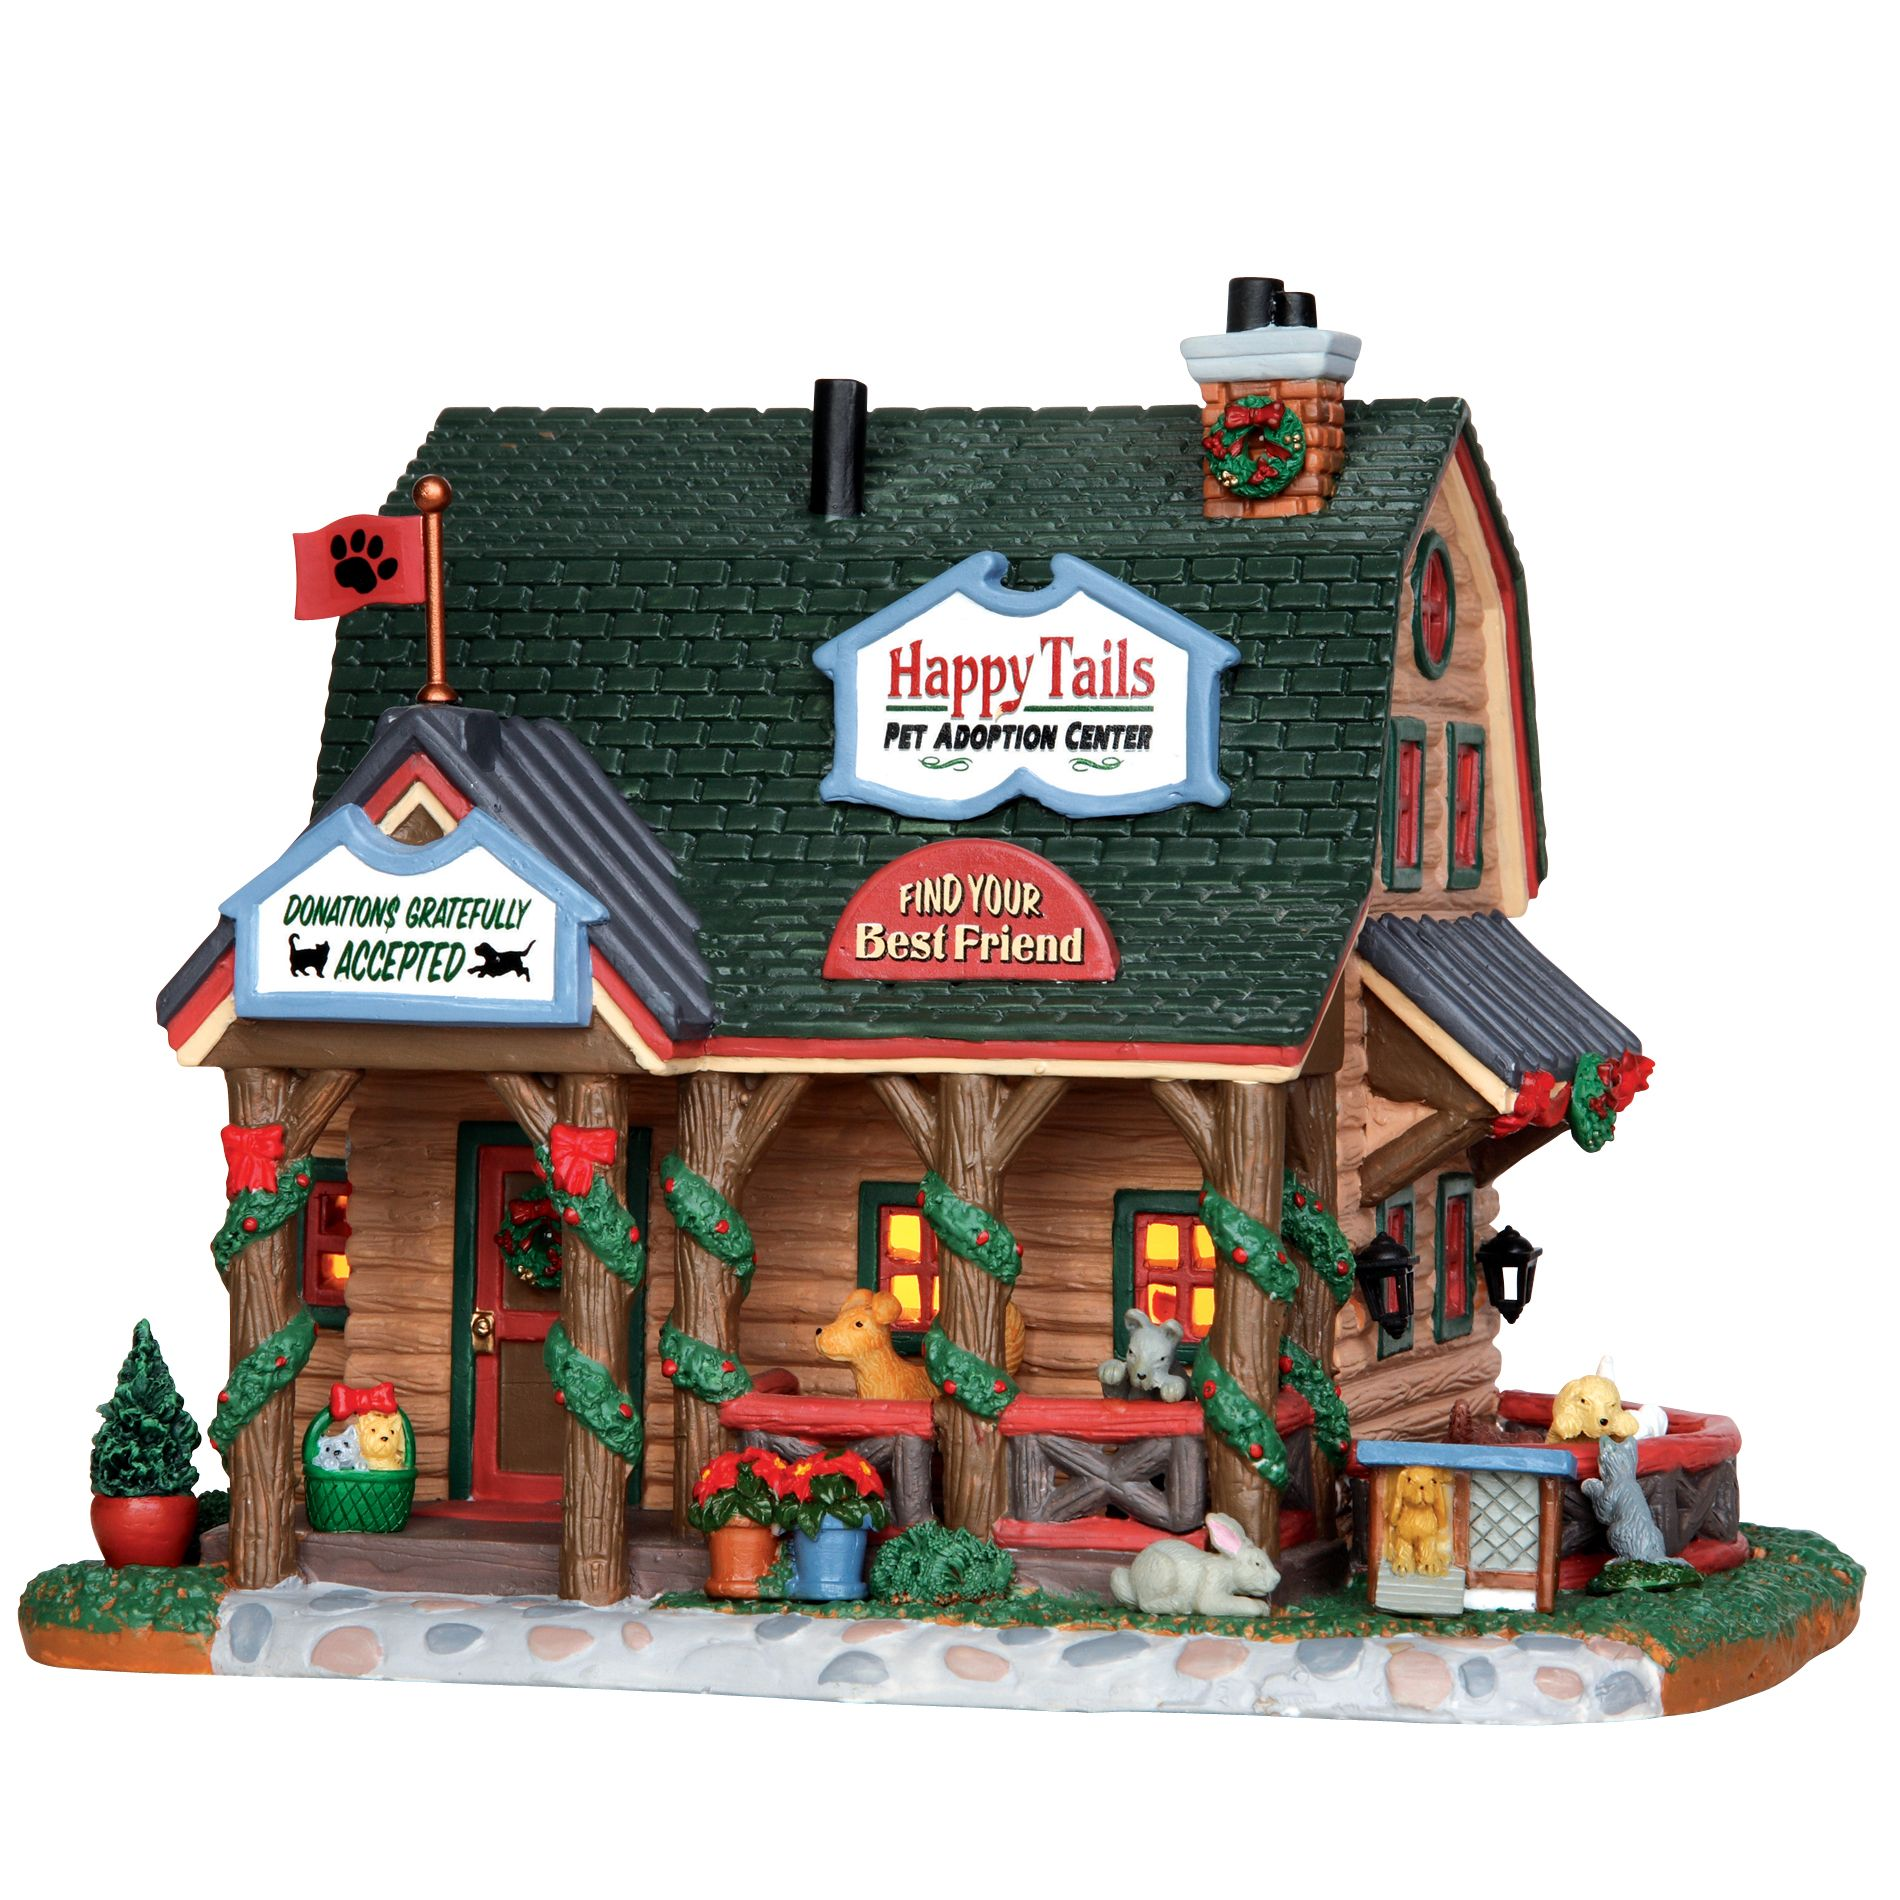 Lemax Village Collection Christmas Village Building, Happy